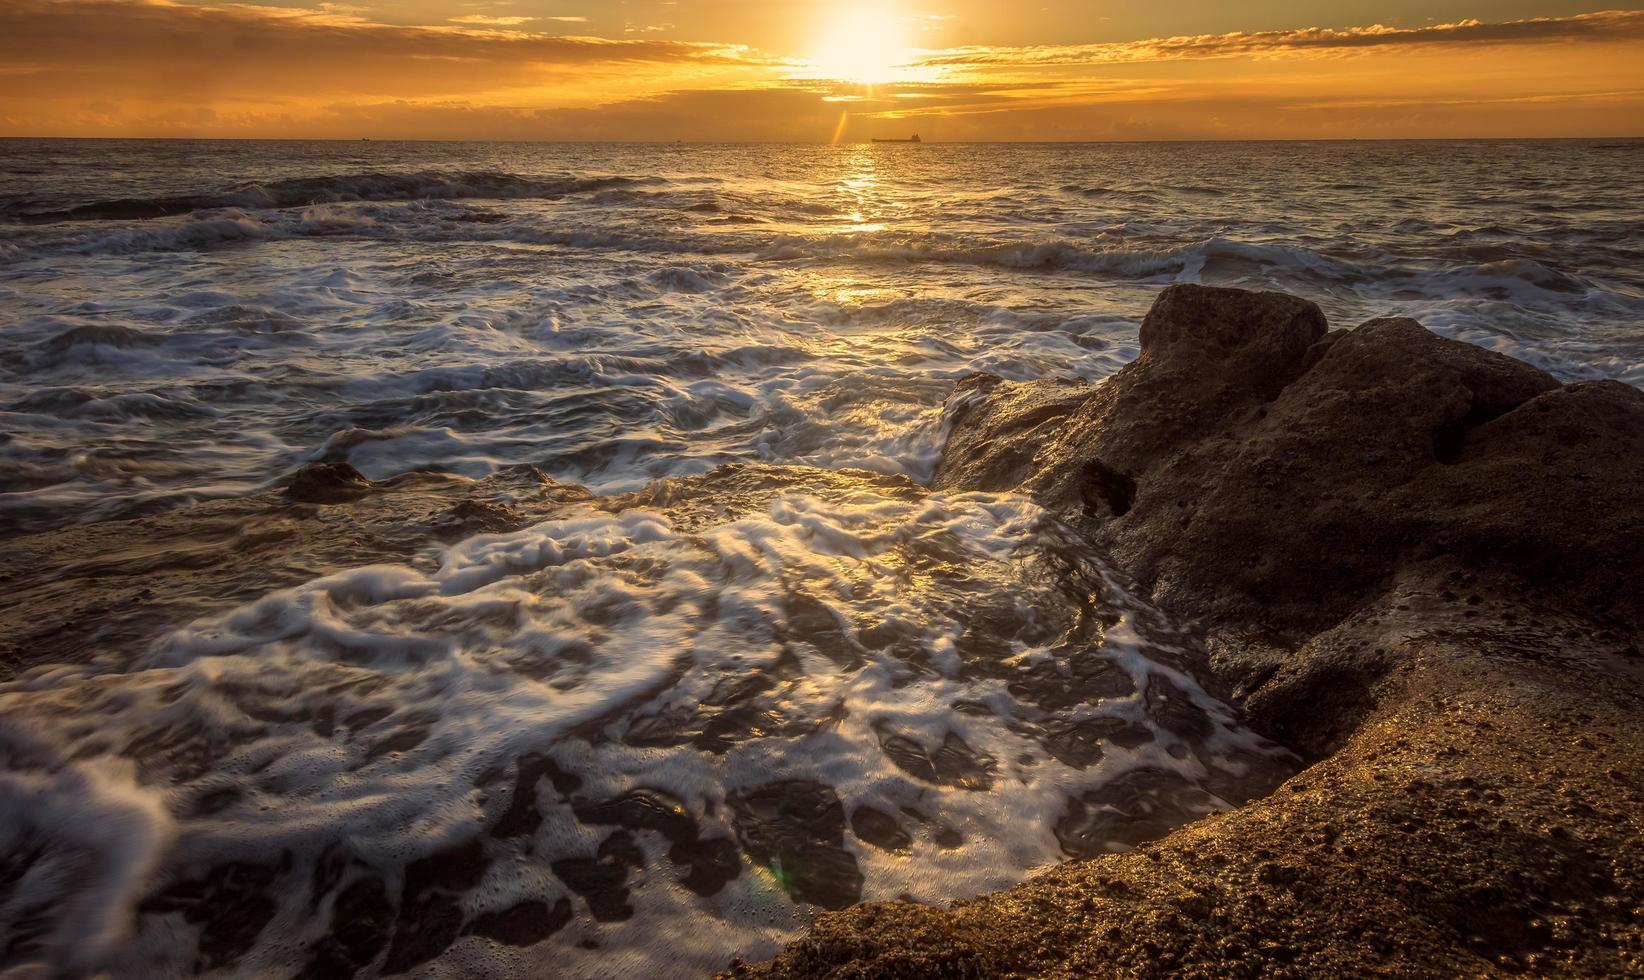 Ozeanwellen, die während des Sonnenuntergangs am Ufer abstürzen foto